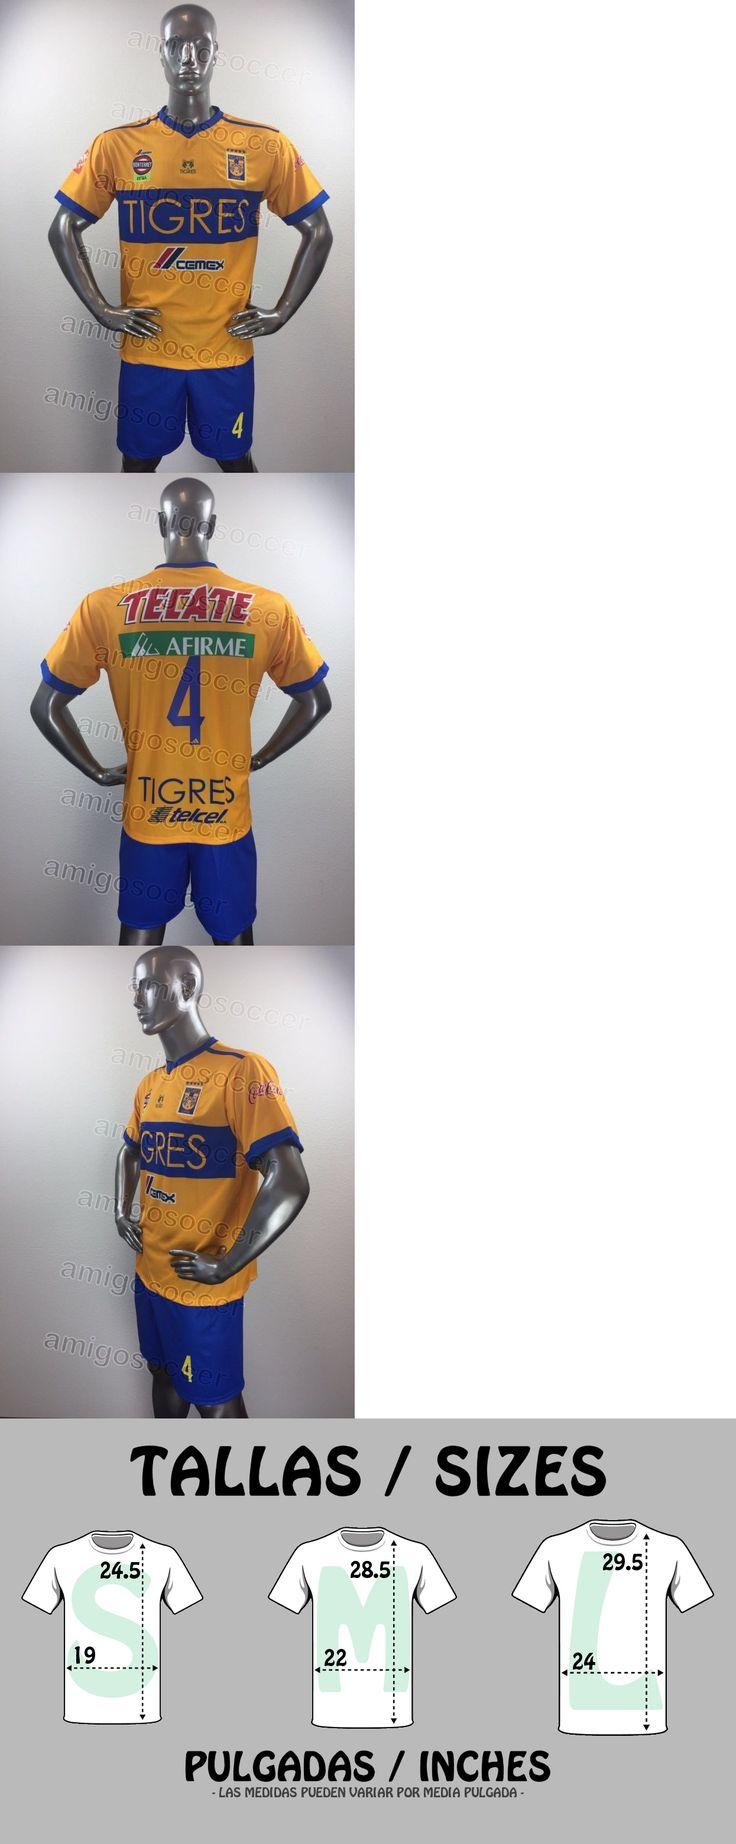 Men 123490: 15 Tigres Home (S M L) Soccer Uniforms - Uniformes De Futbol -> BUY IT NOW ONLY: $300 on eBay!